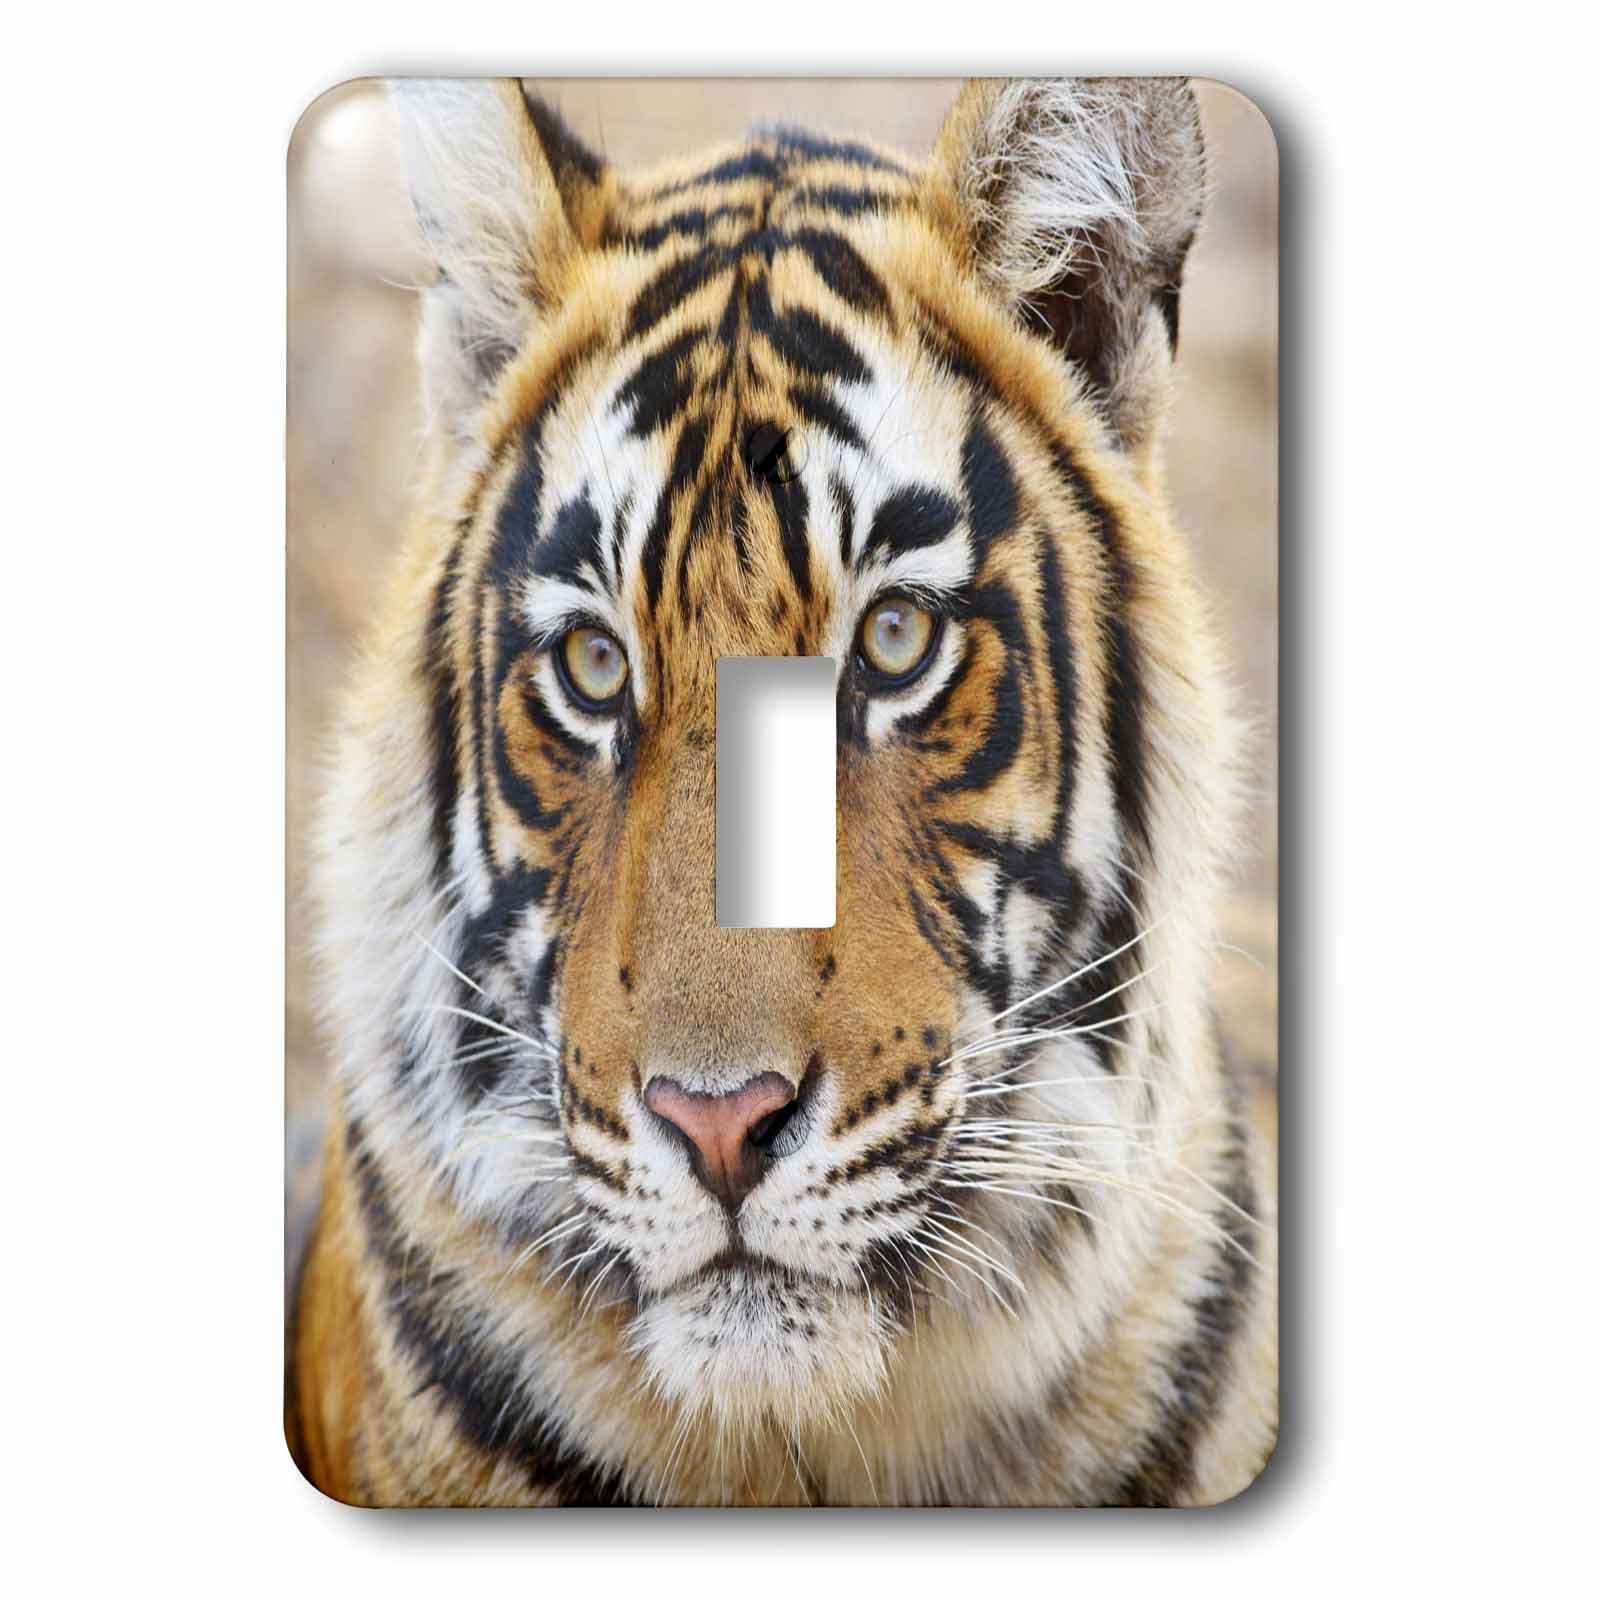 3dRose lsp_75677_1 Royal Bengal Tiger, Ranthambhor National Park, India-As10 Jra0271 Jagdeep Rajput Light Switch Cover